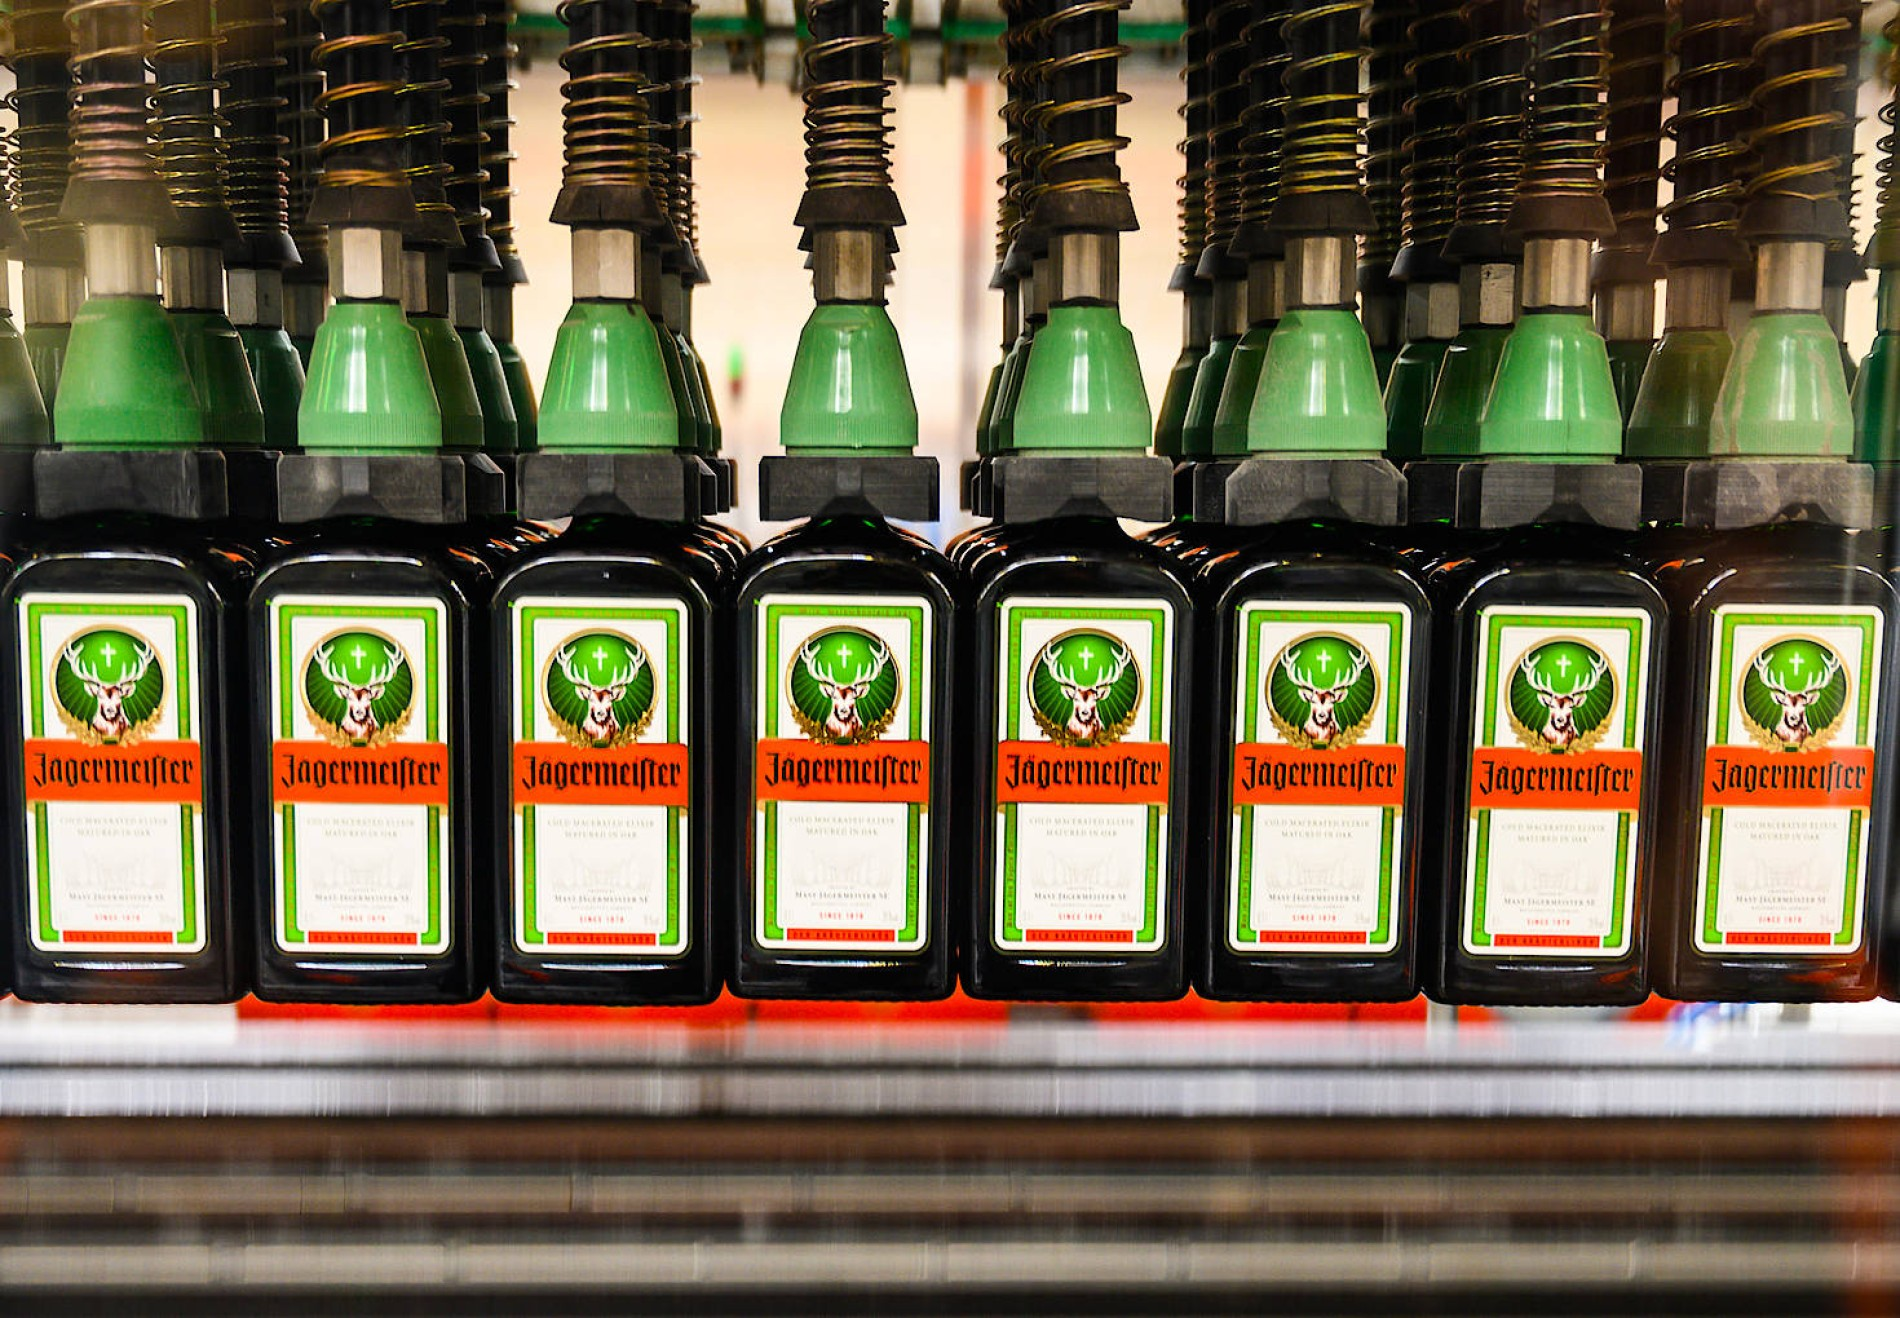 corona jagermeister liefert alkohol